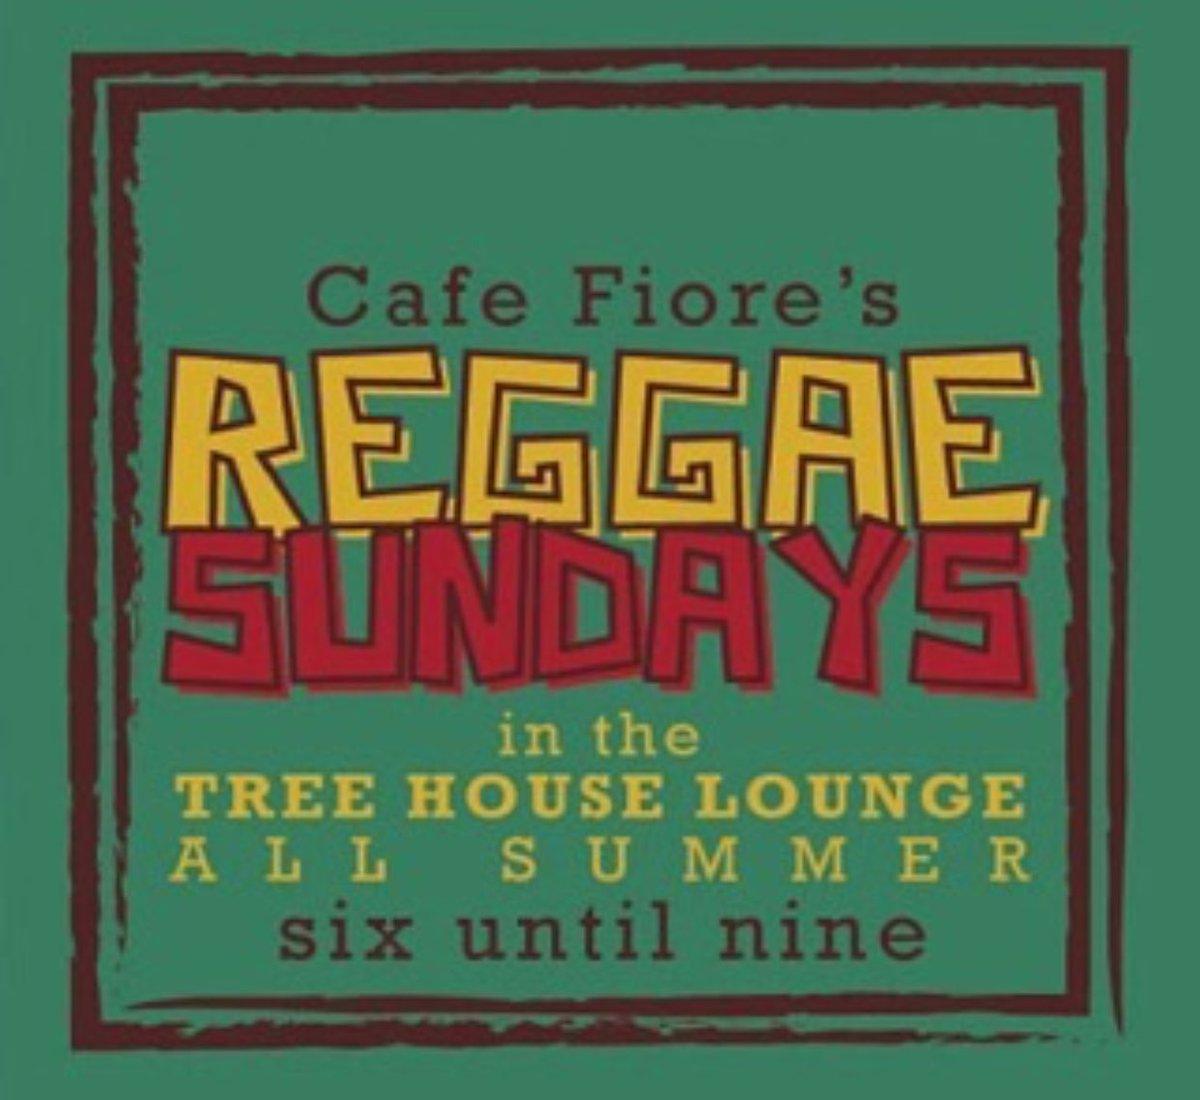 Cafe Fiore Ventura On Twitter Reggae Sunday Tonight From 6 9pm